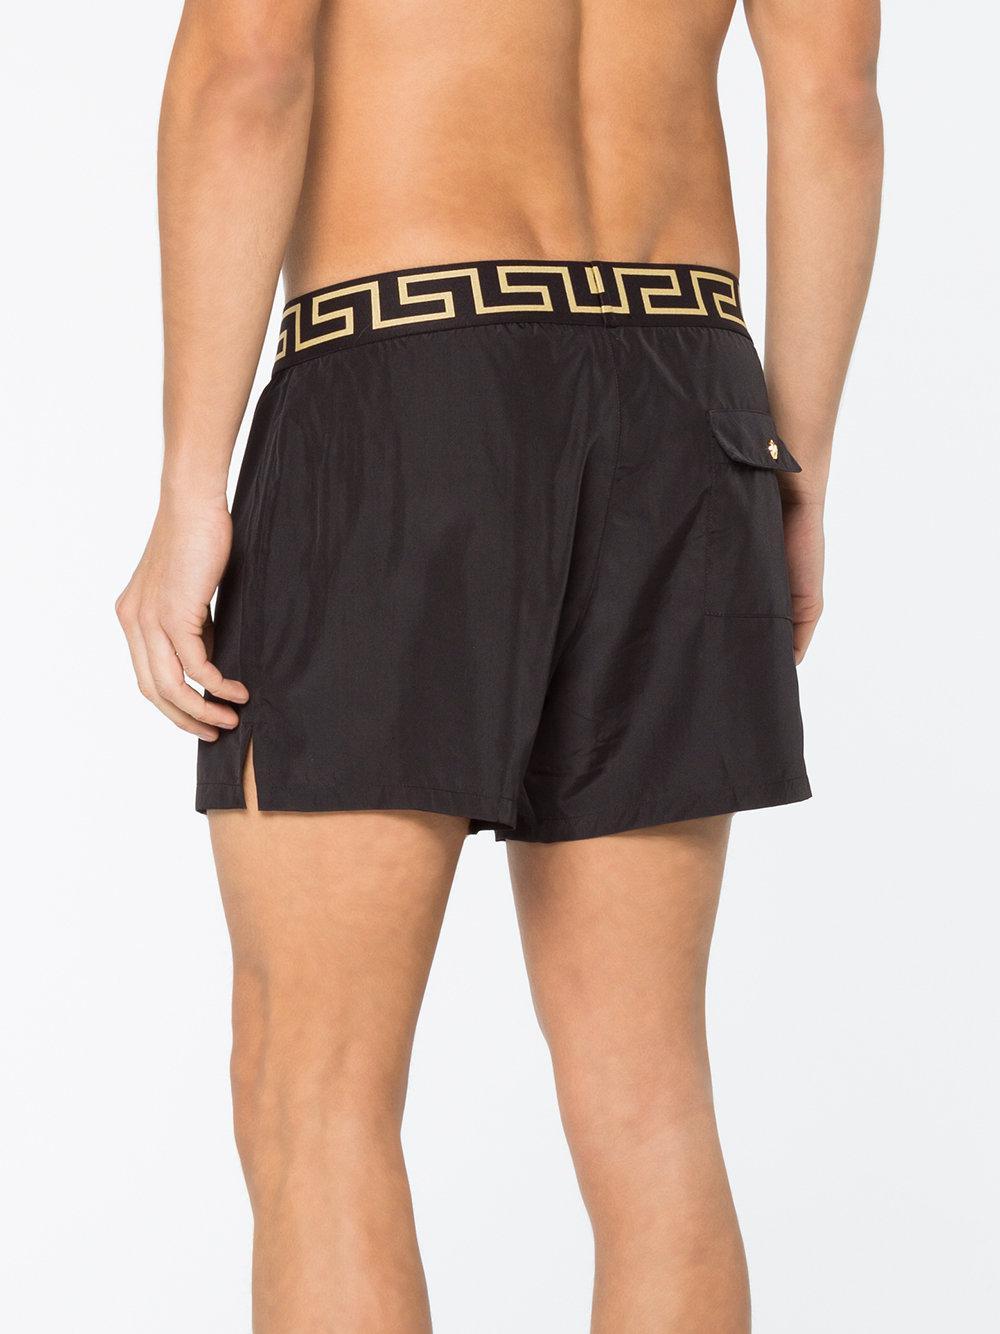 da28753e34229 Versace Greek Key Border Swim Shorts in Black for Men - Save 41% - Lyst